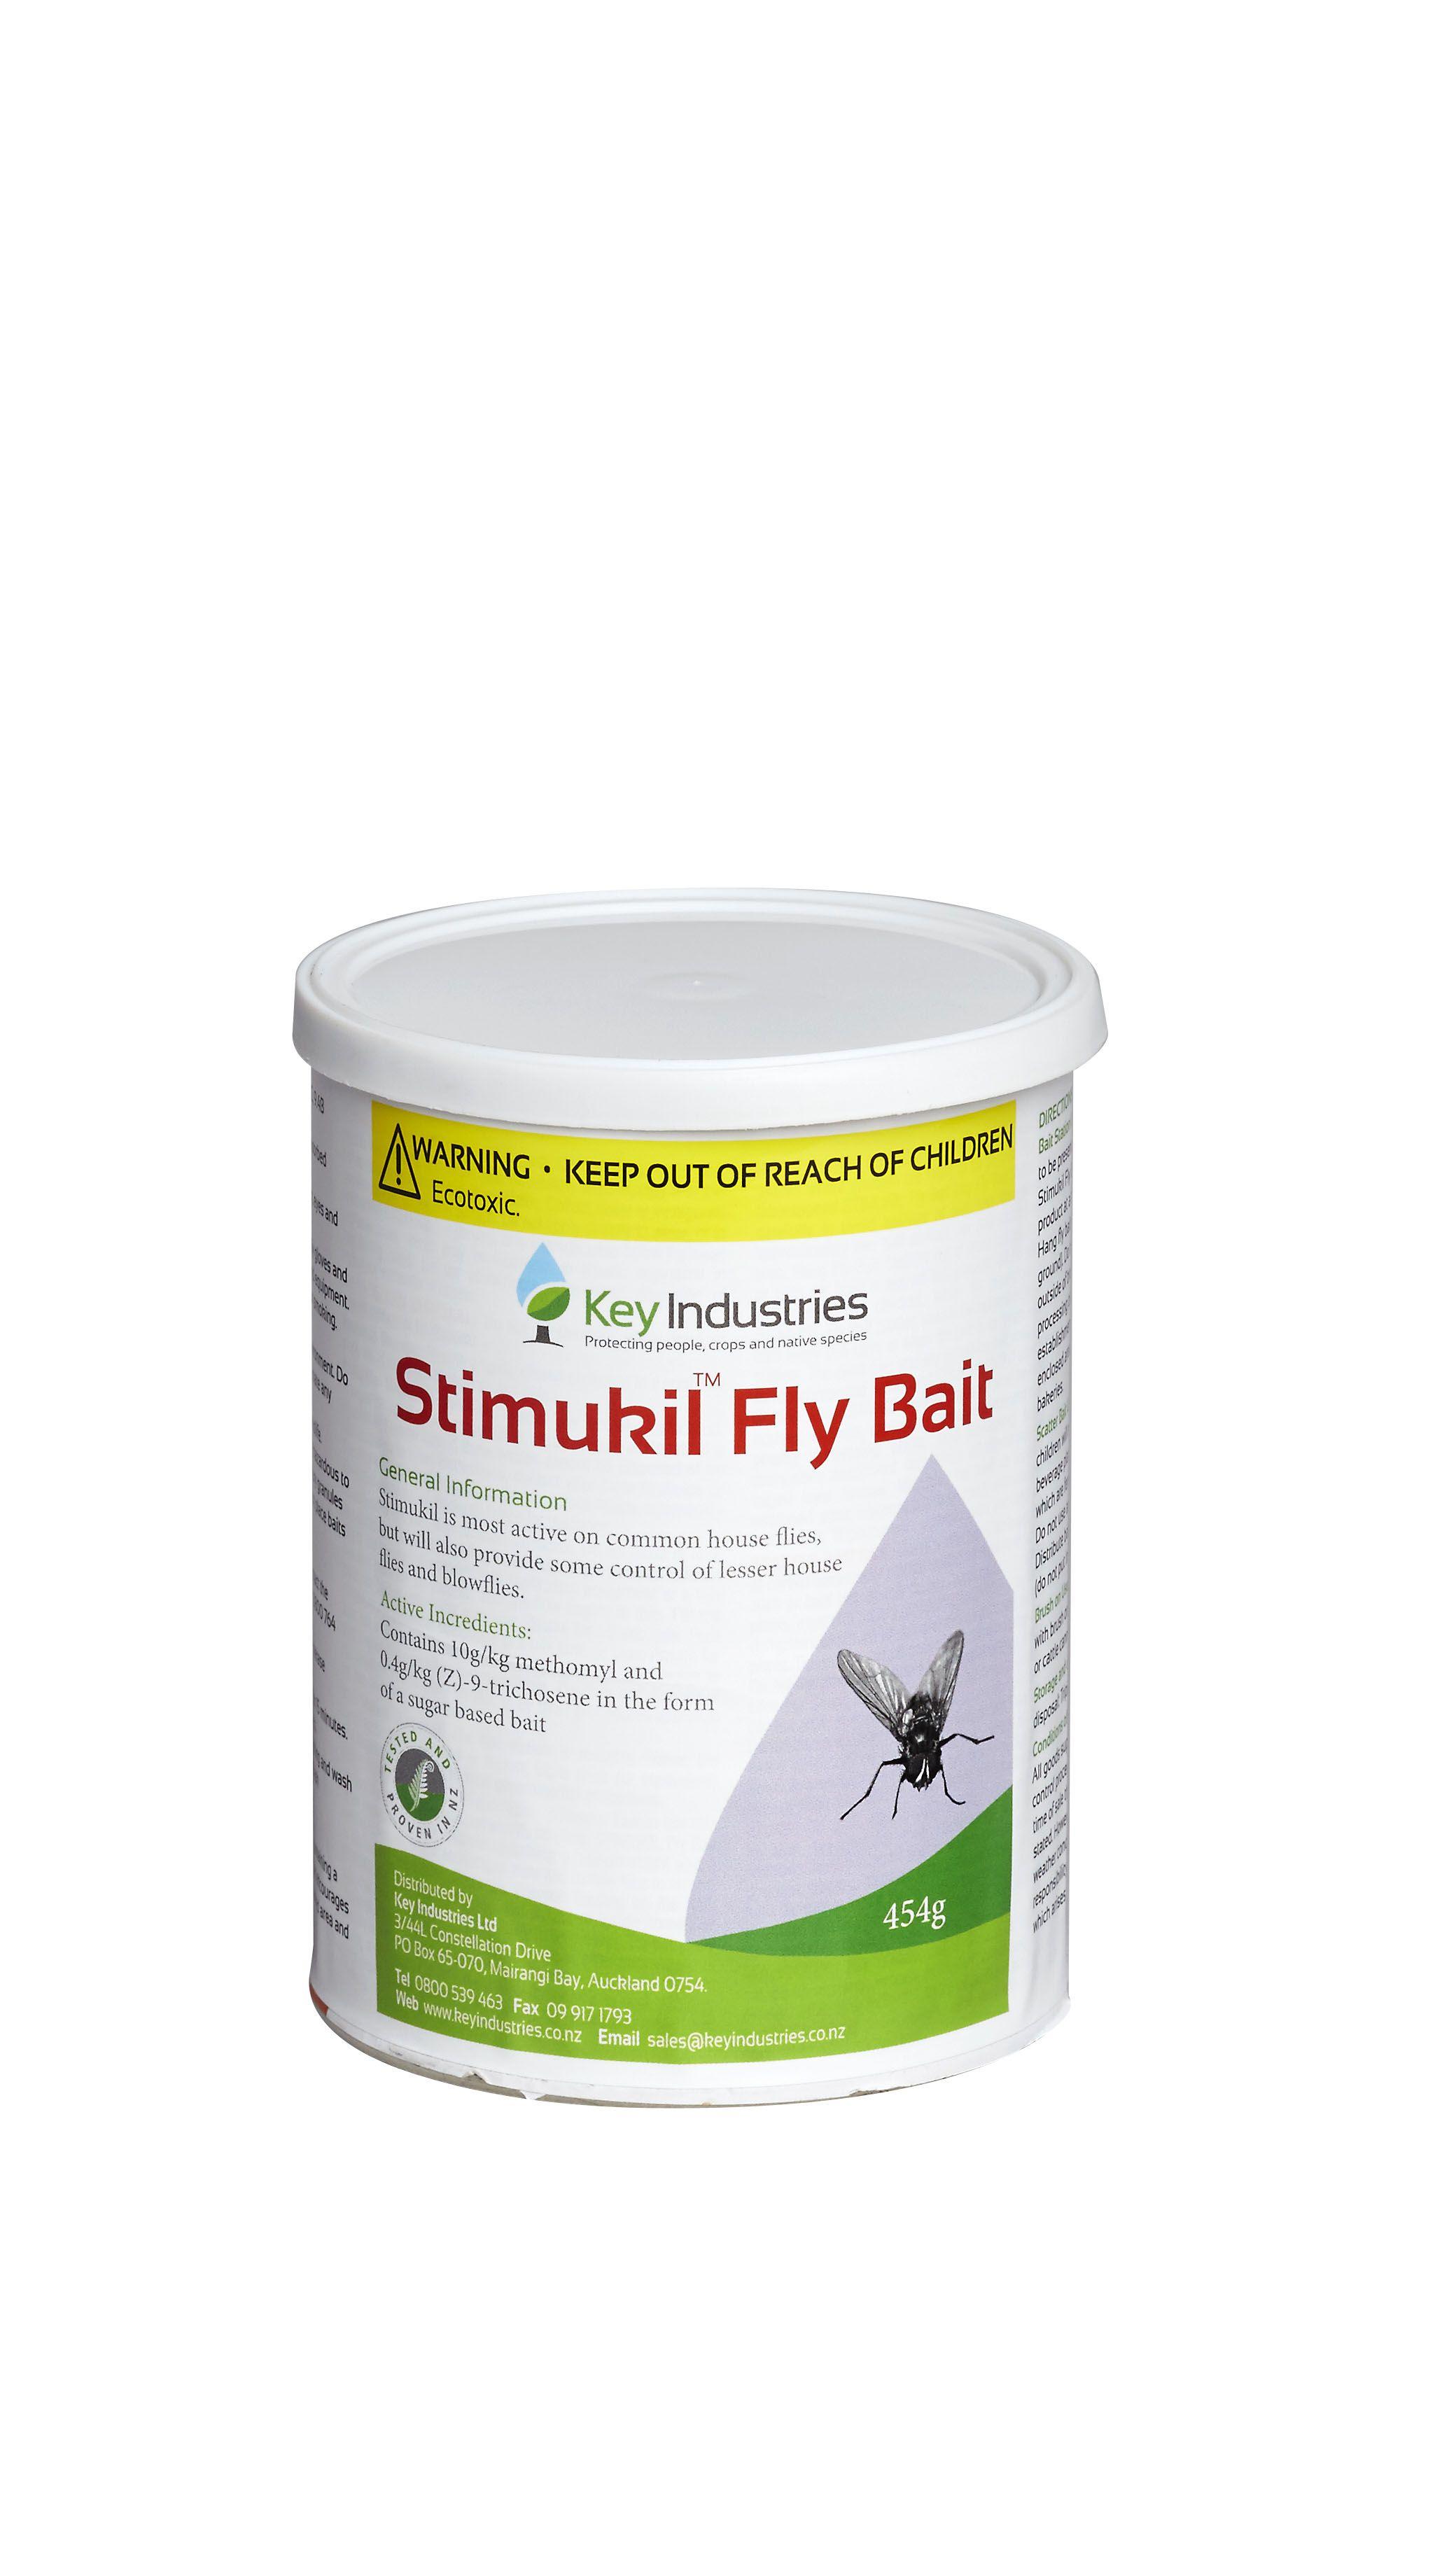 Stimukil Fly Bait 454g Fly bait, Bait, Pest control